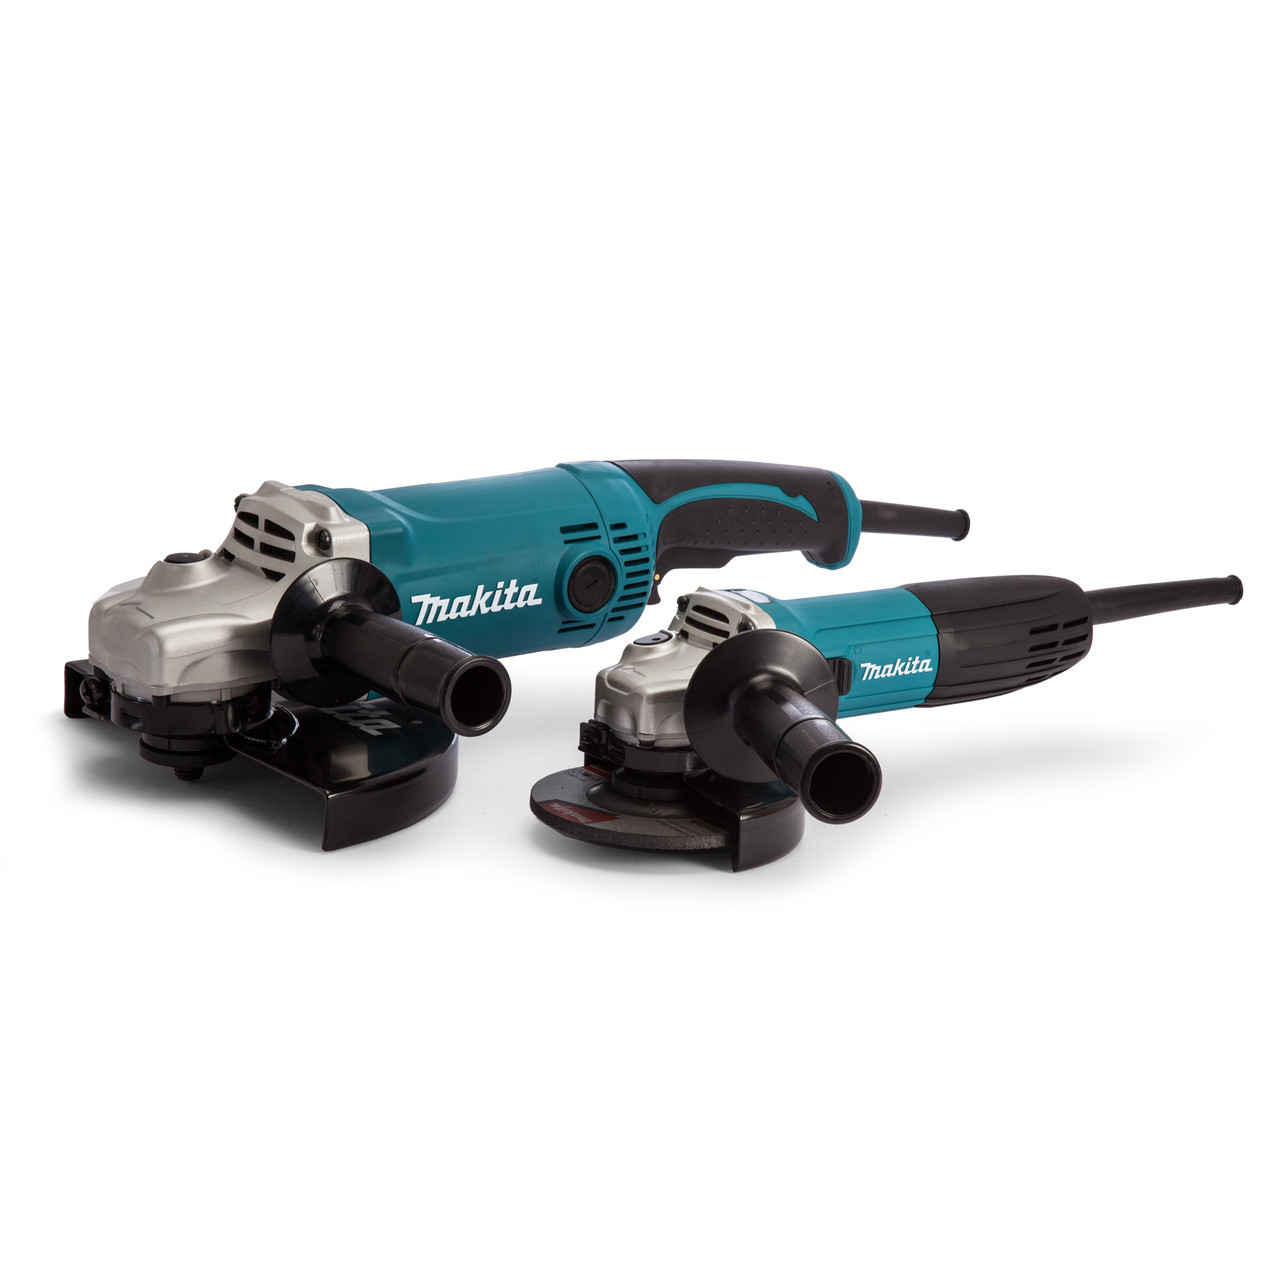 Makita Grinder Twin Pack 240v MAKDK0056Z1/2 | GA4530R 115mm | GA9050 230mm | toolforce.ie